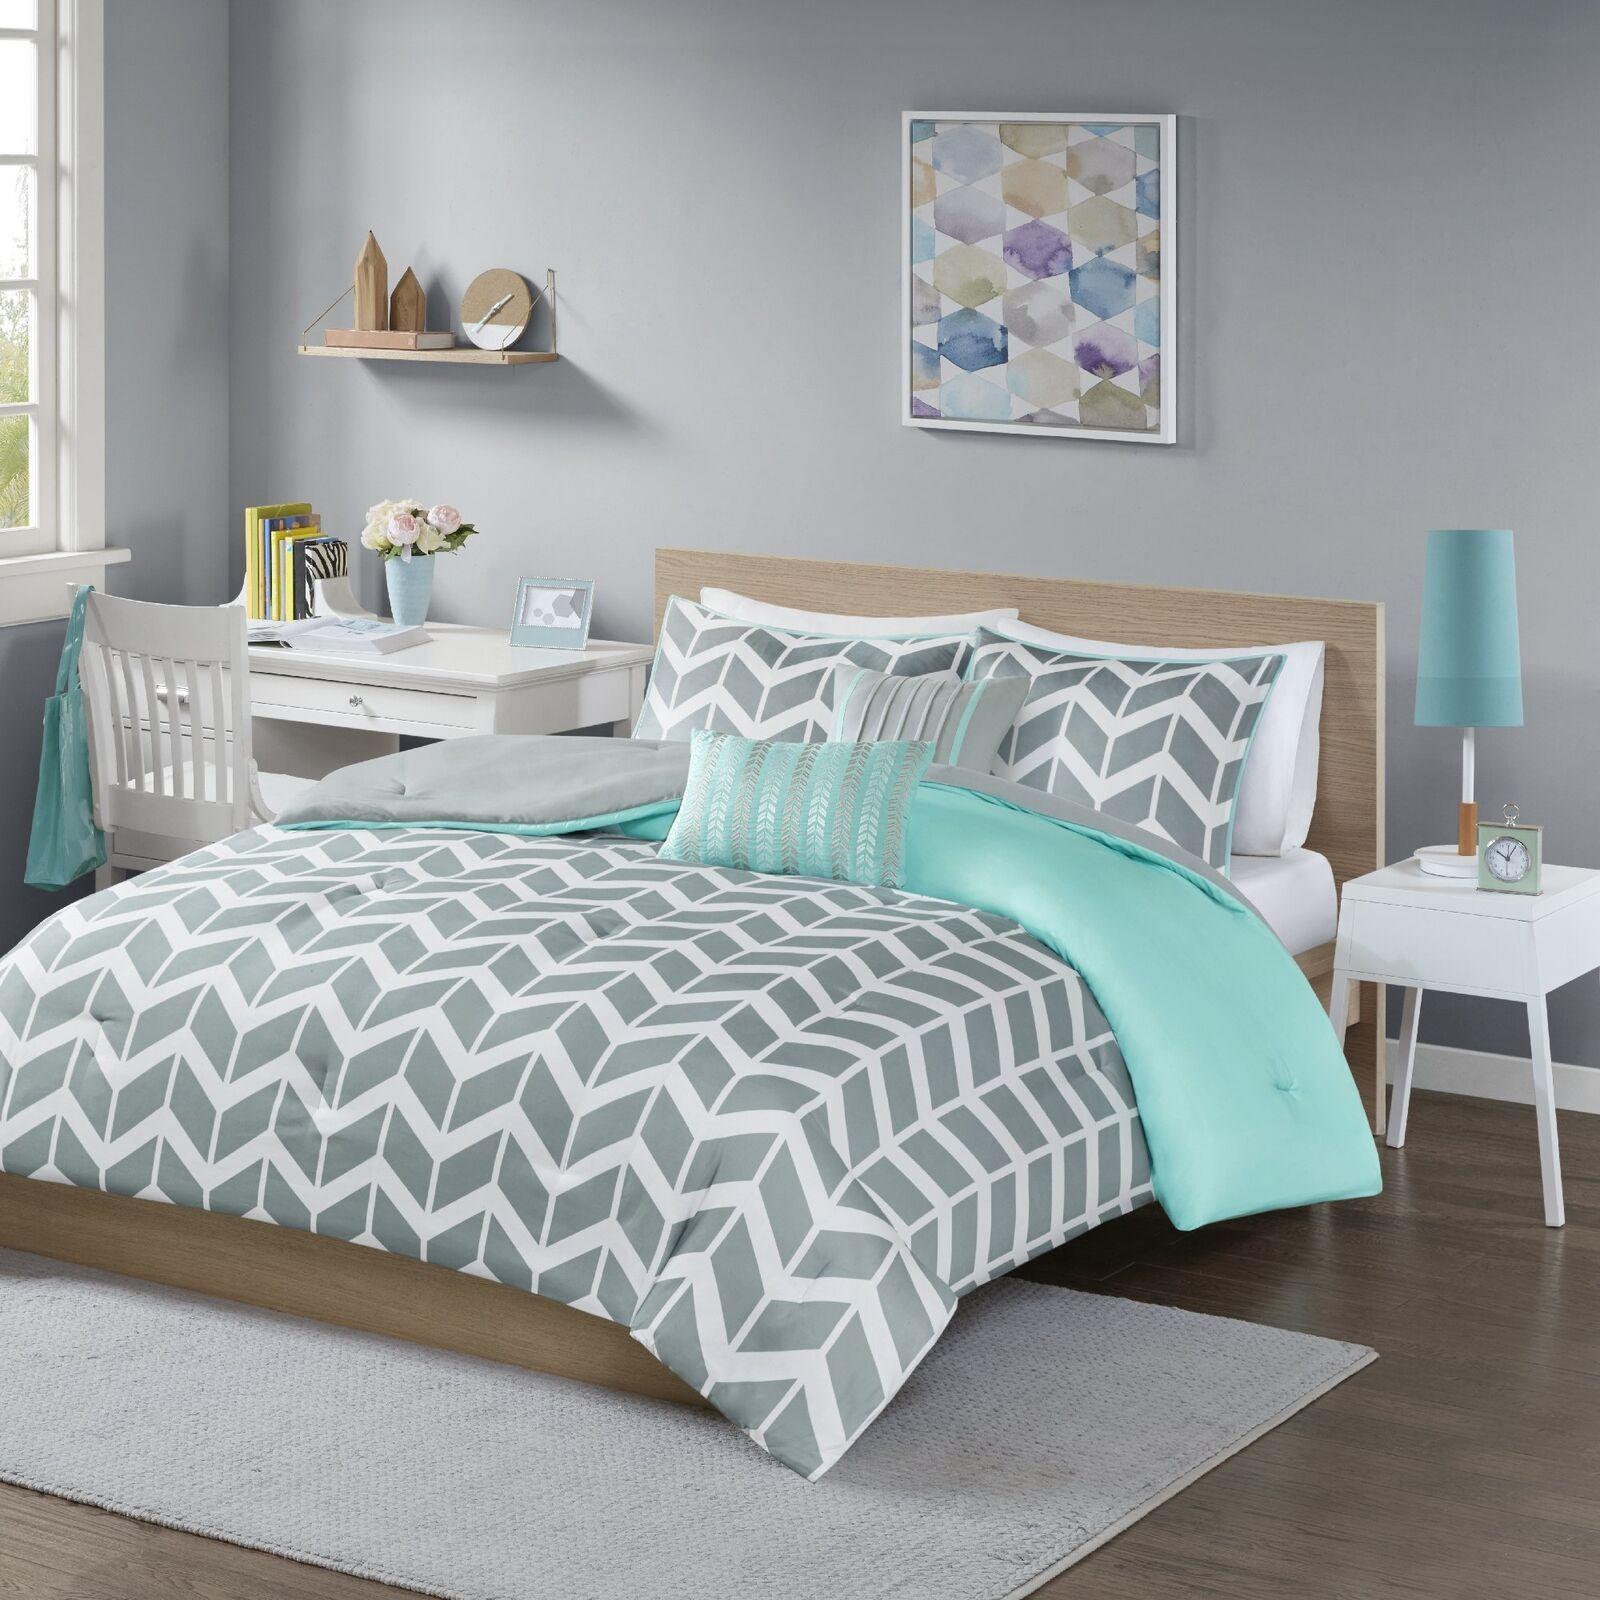 Intelligent Design Nadia Comforter Set Twin Twin X-Large, Teal